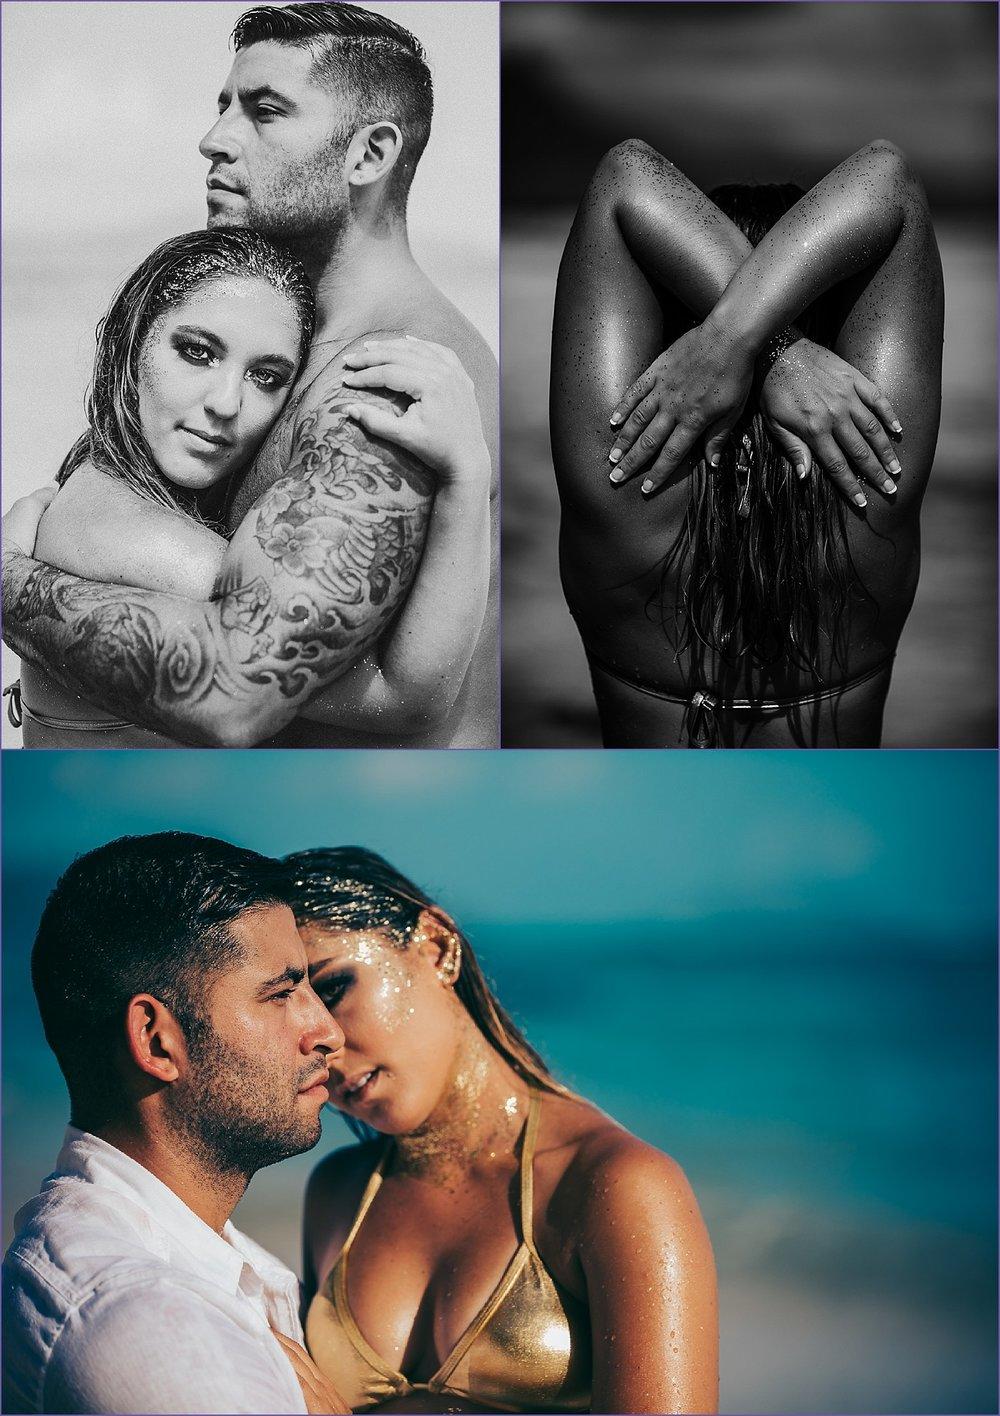 Mermaid Couple Glamour Hawaii Waimanalo beach Styled PhotoShoot - Ketino Photography - Oahu Family and Glamour Photographer.jpg